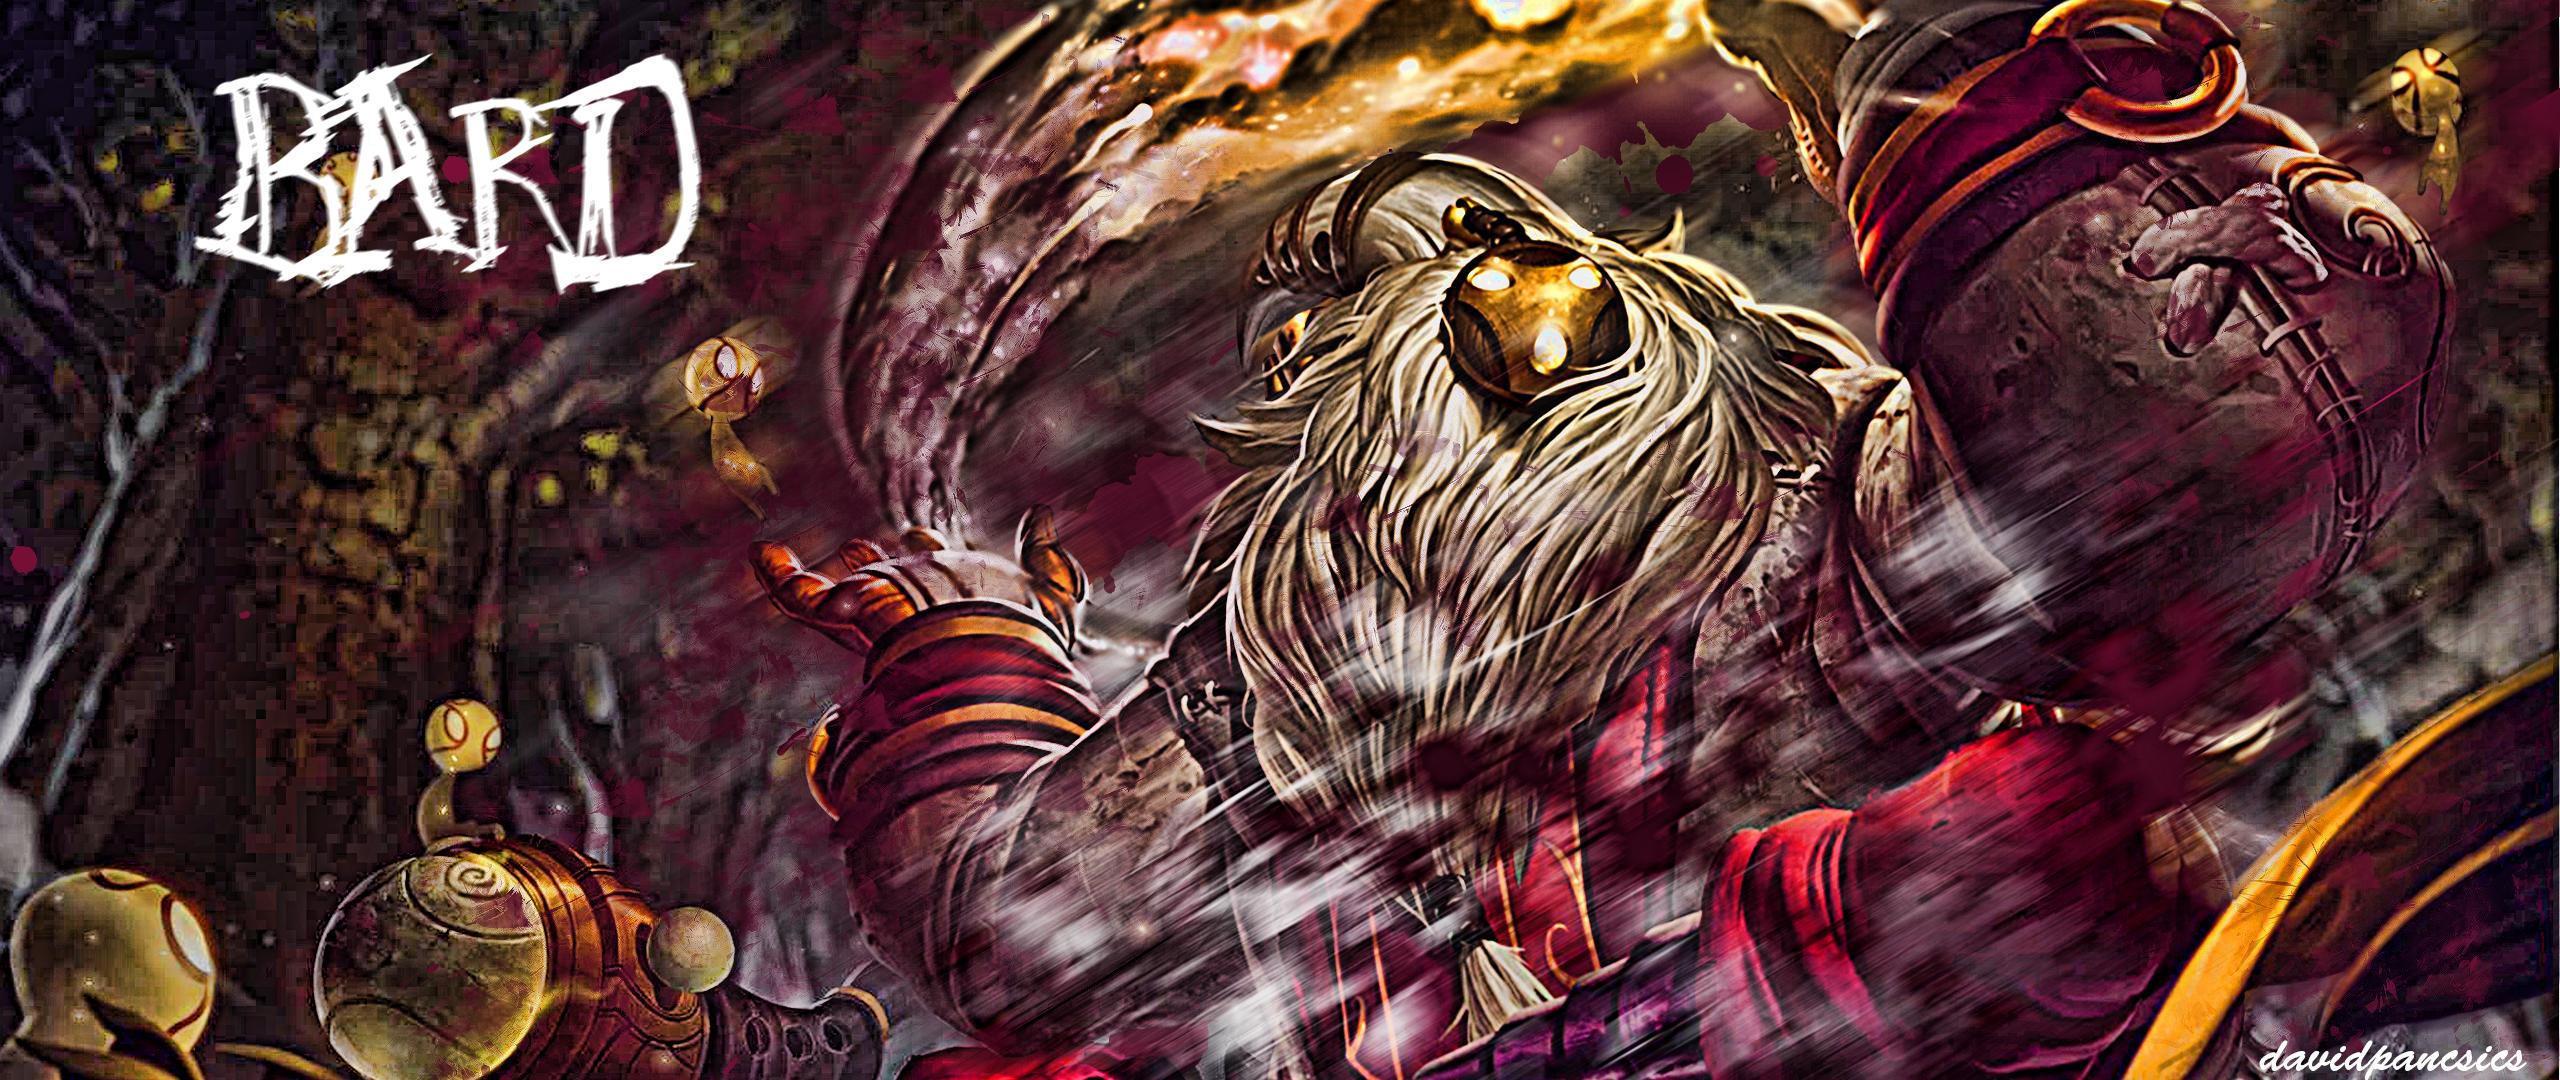 League Of Legends Bard Wallpaper By Pancsicsdavid On Deviantart